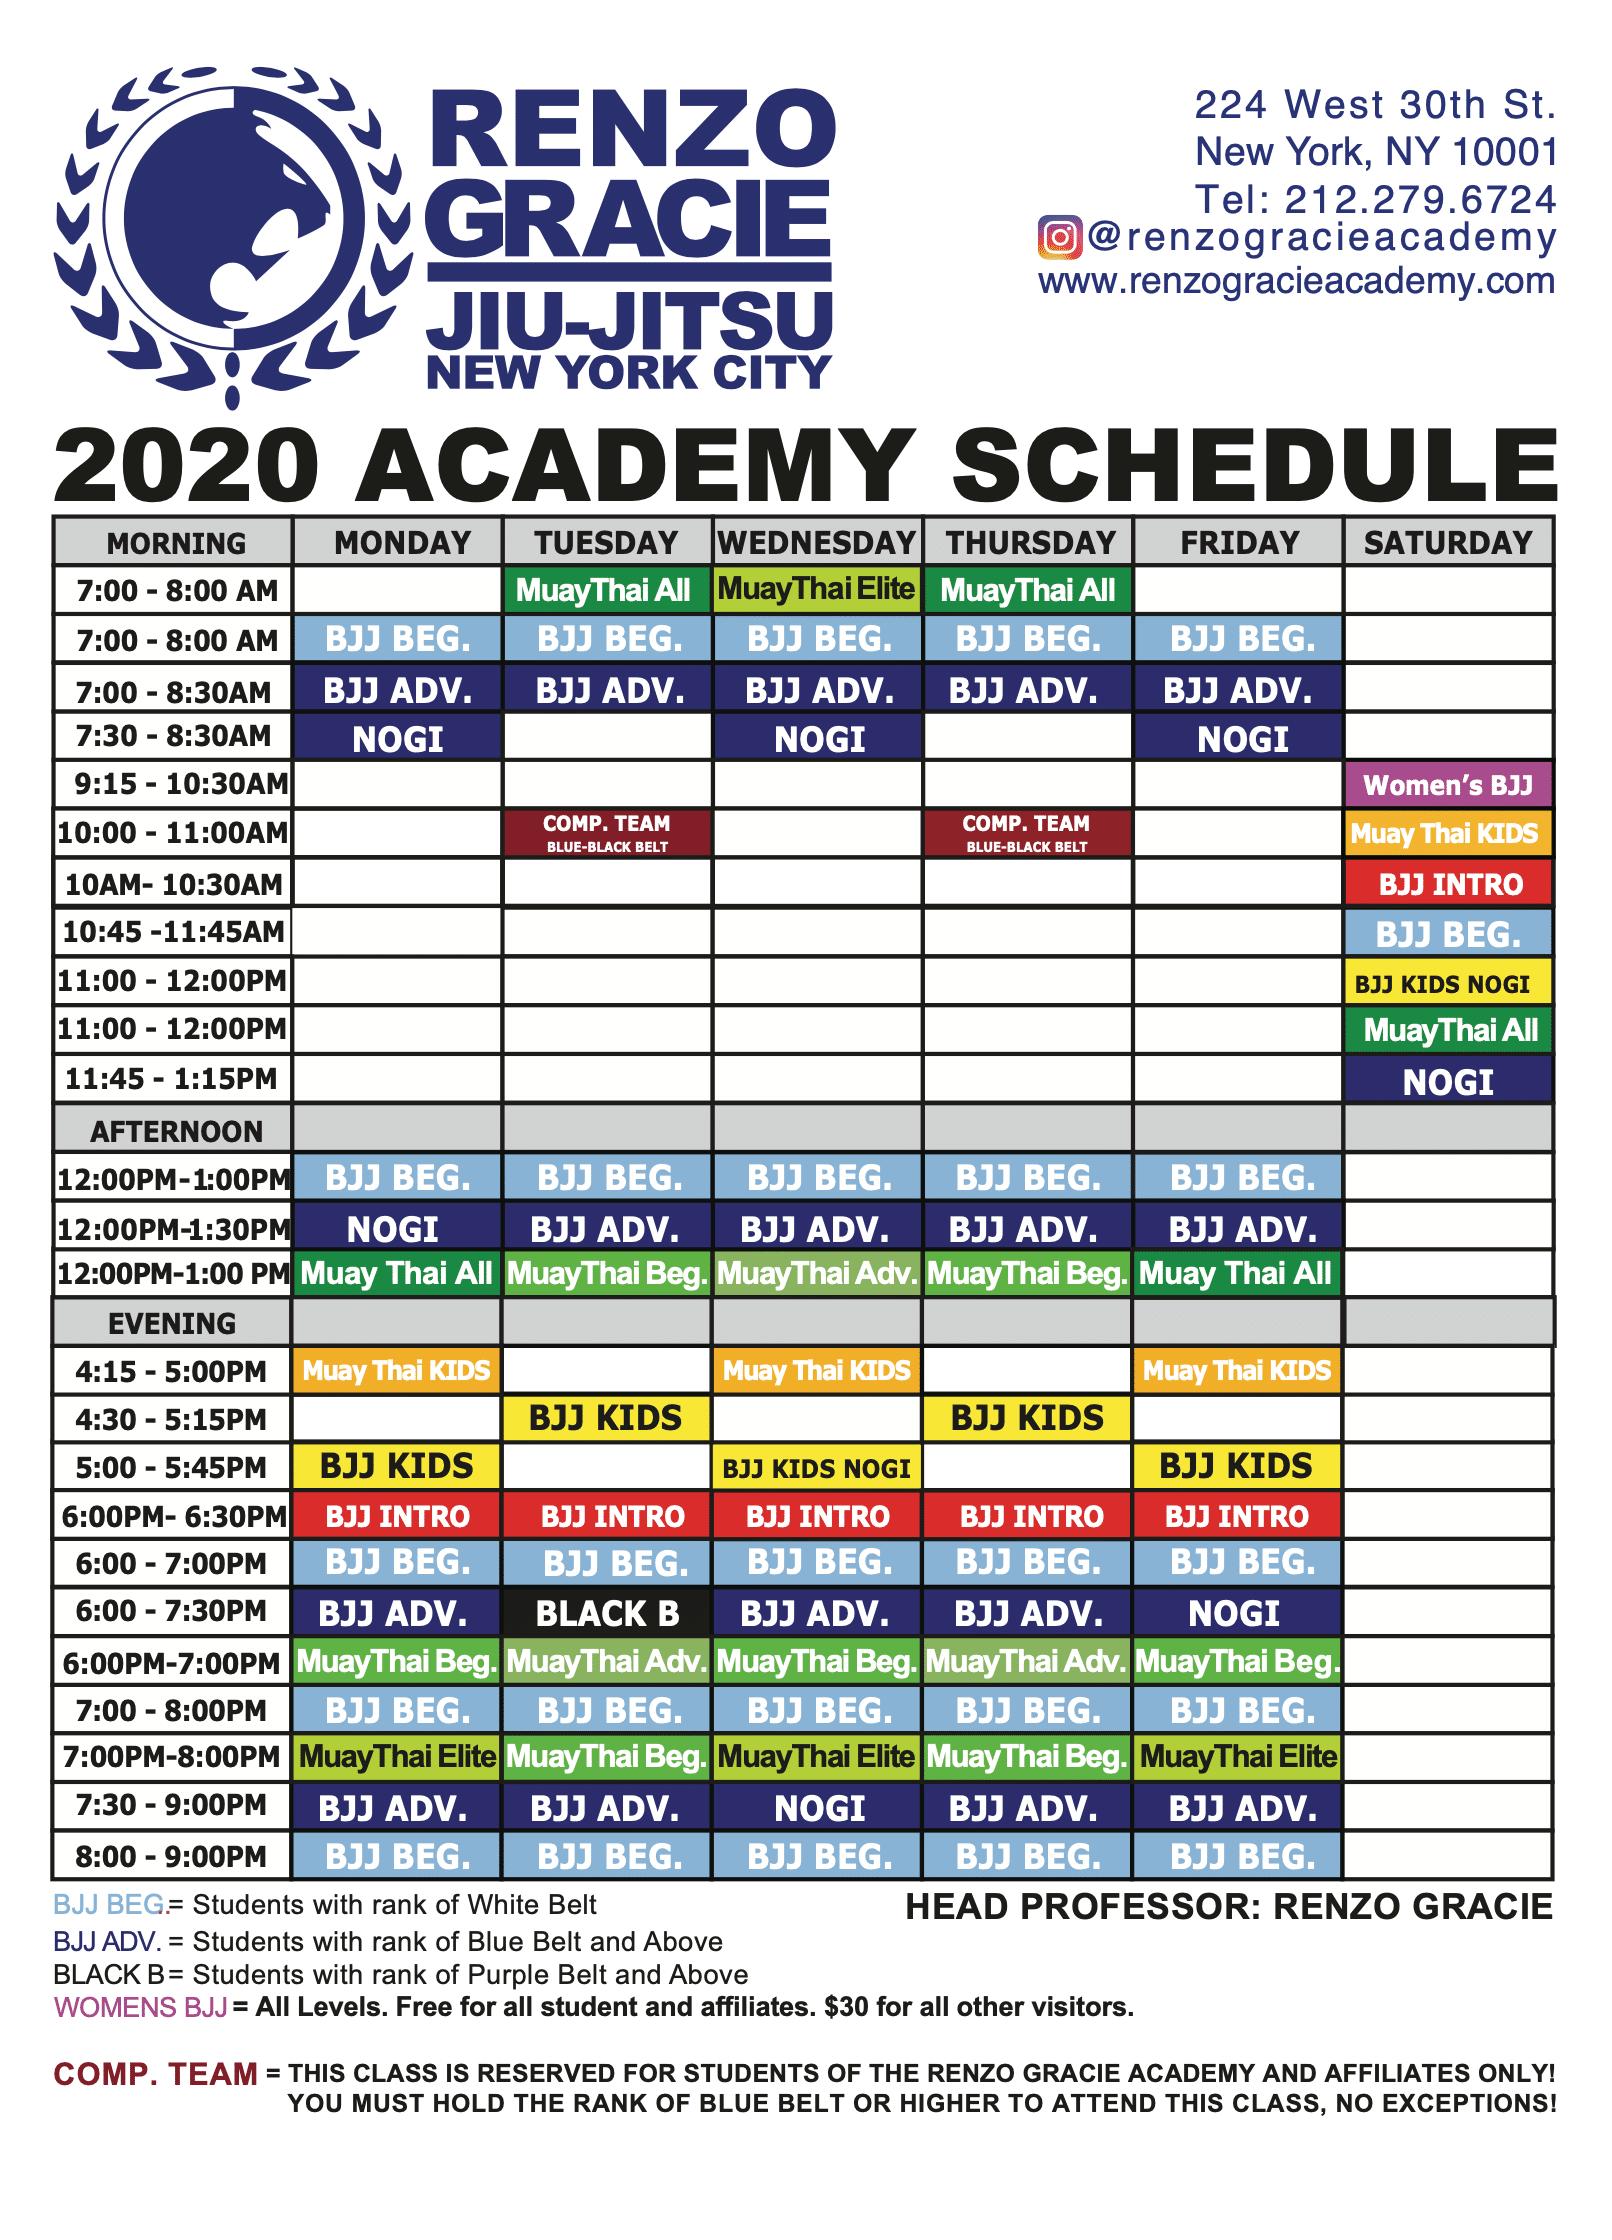 Renzo Gracie Academy 2020 Class Schedule